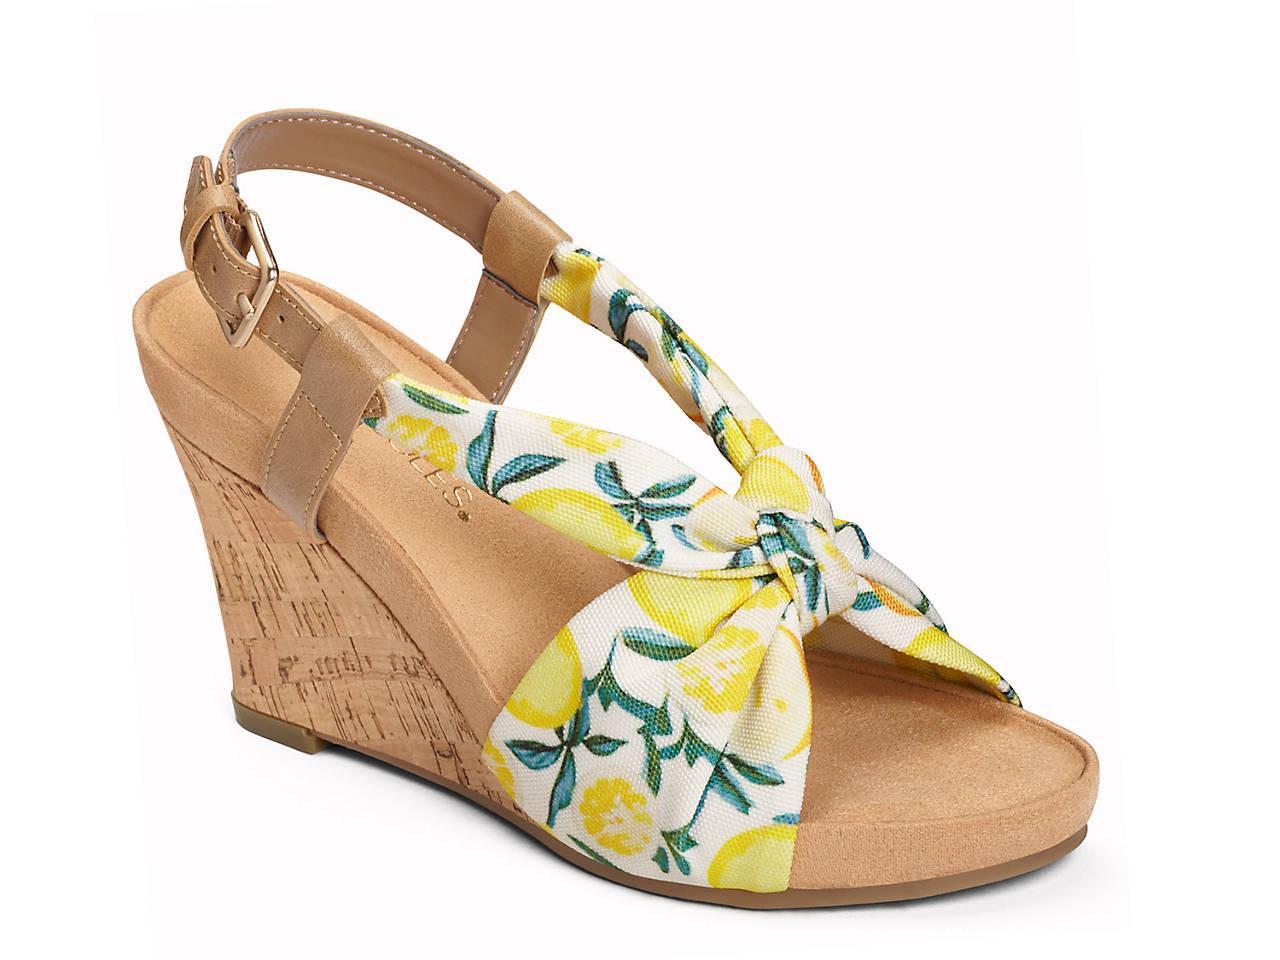 ca72e1da05f4 Aerosoles Plush Pillow Printed Wedge Sandal Women s Shoes